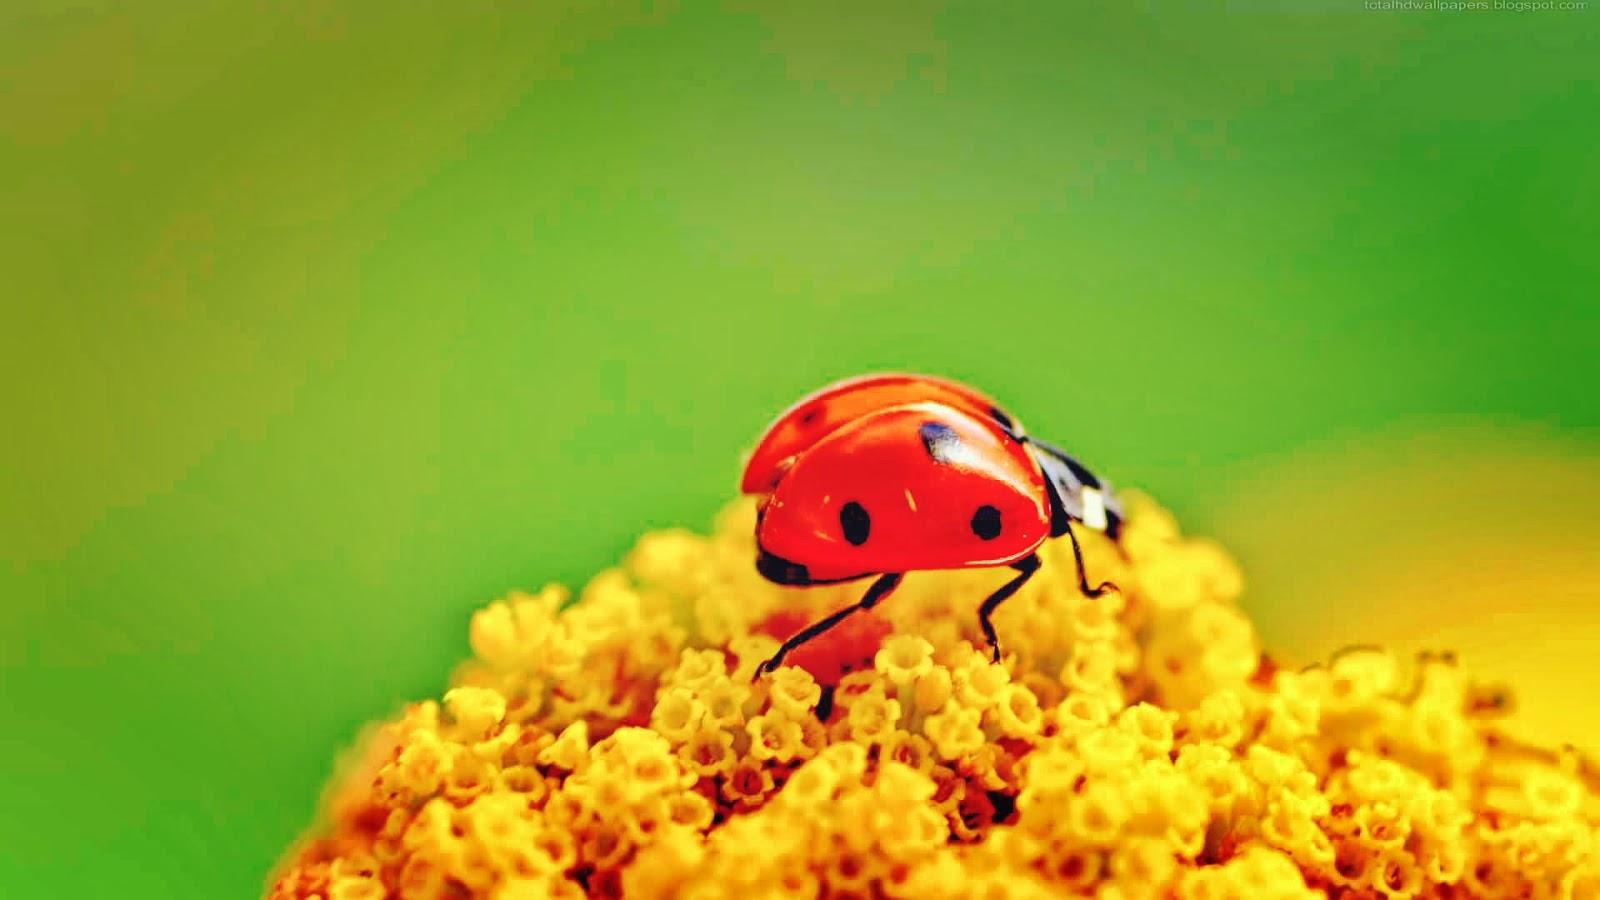 Beautiful Ladybugs Macro wallpapers | All HD Wallpaper 2014